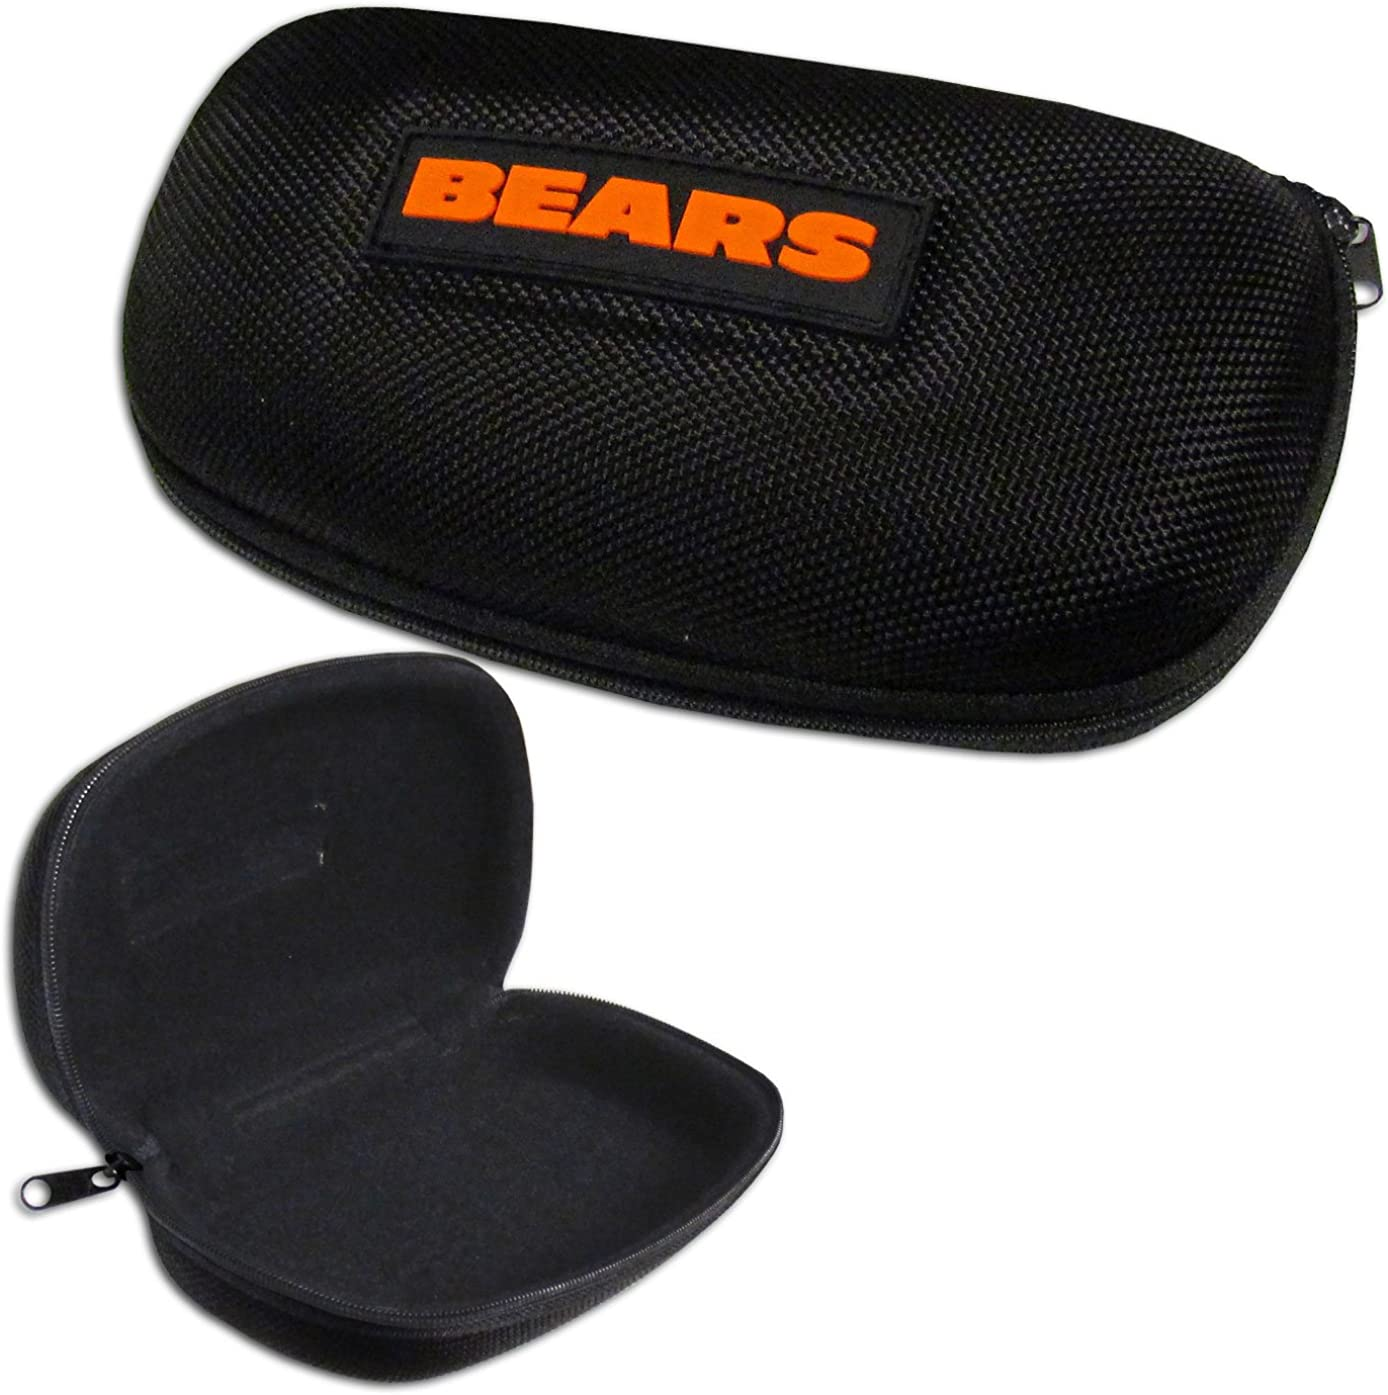 Siskiyou NFL Chicago Bears Sunglass and Accessory Set